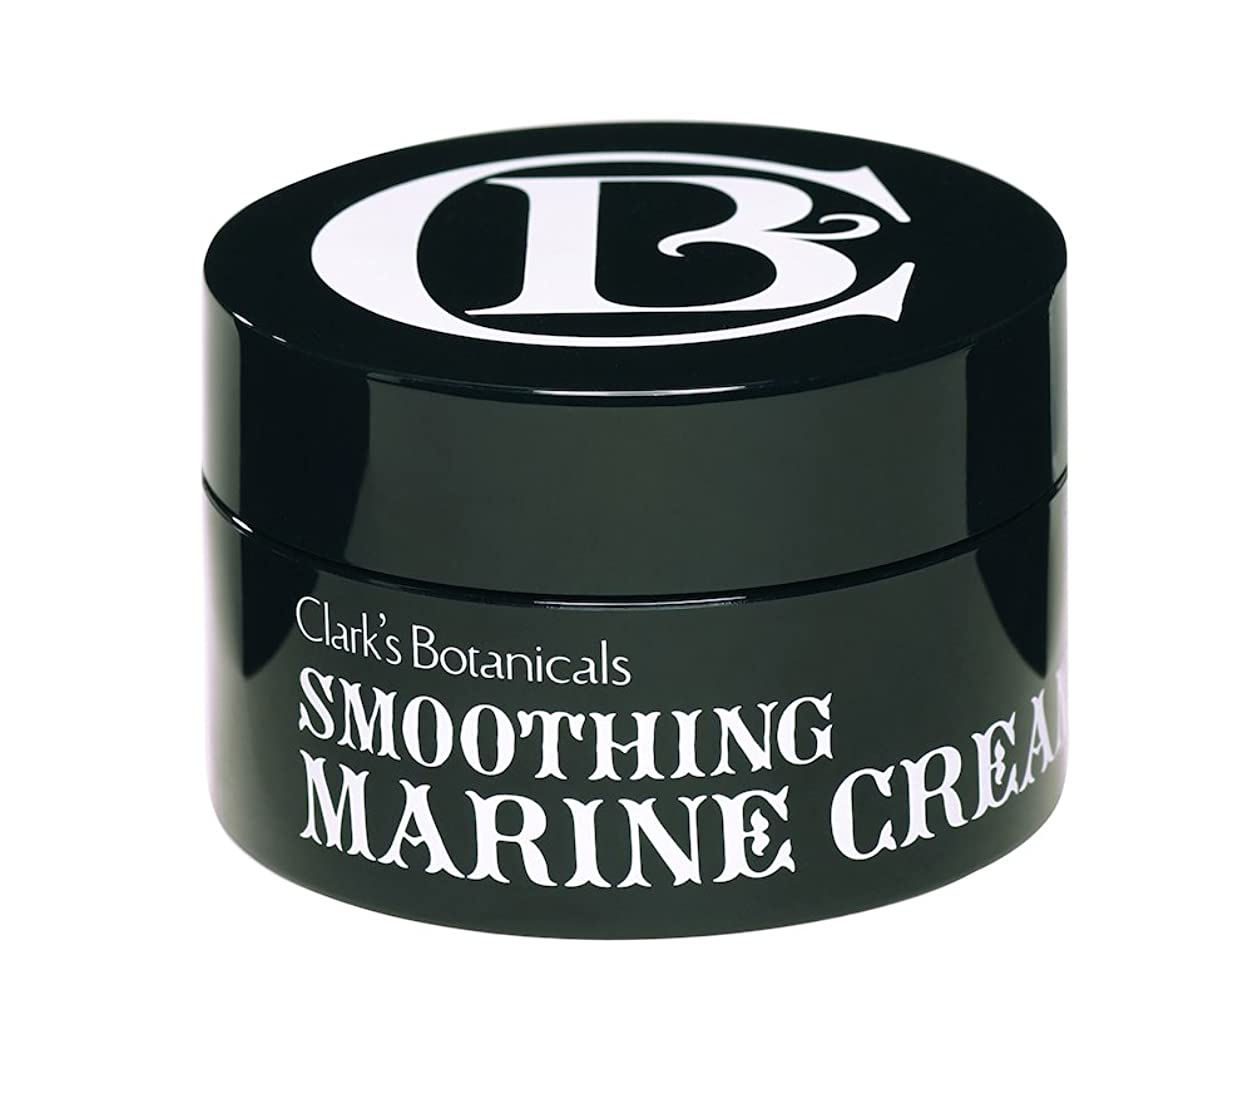 Clark's Botanicals Smoothing Marine Cream 1.7 Fl Oz/ 50ml